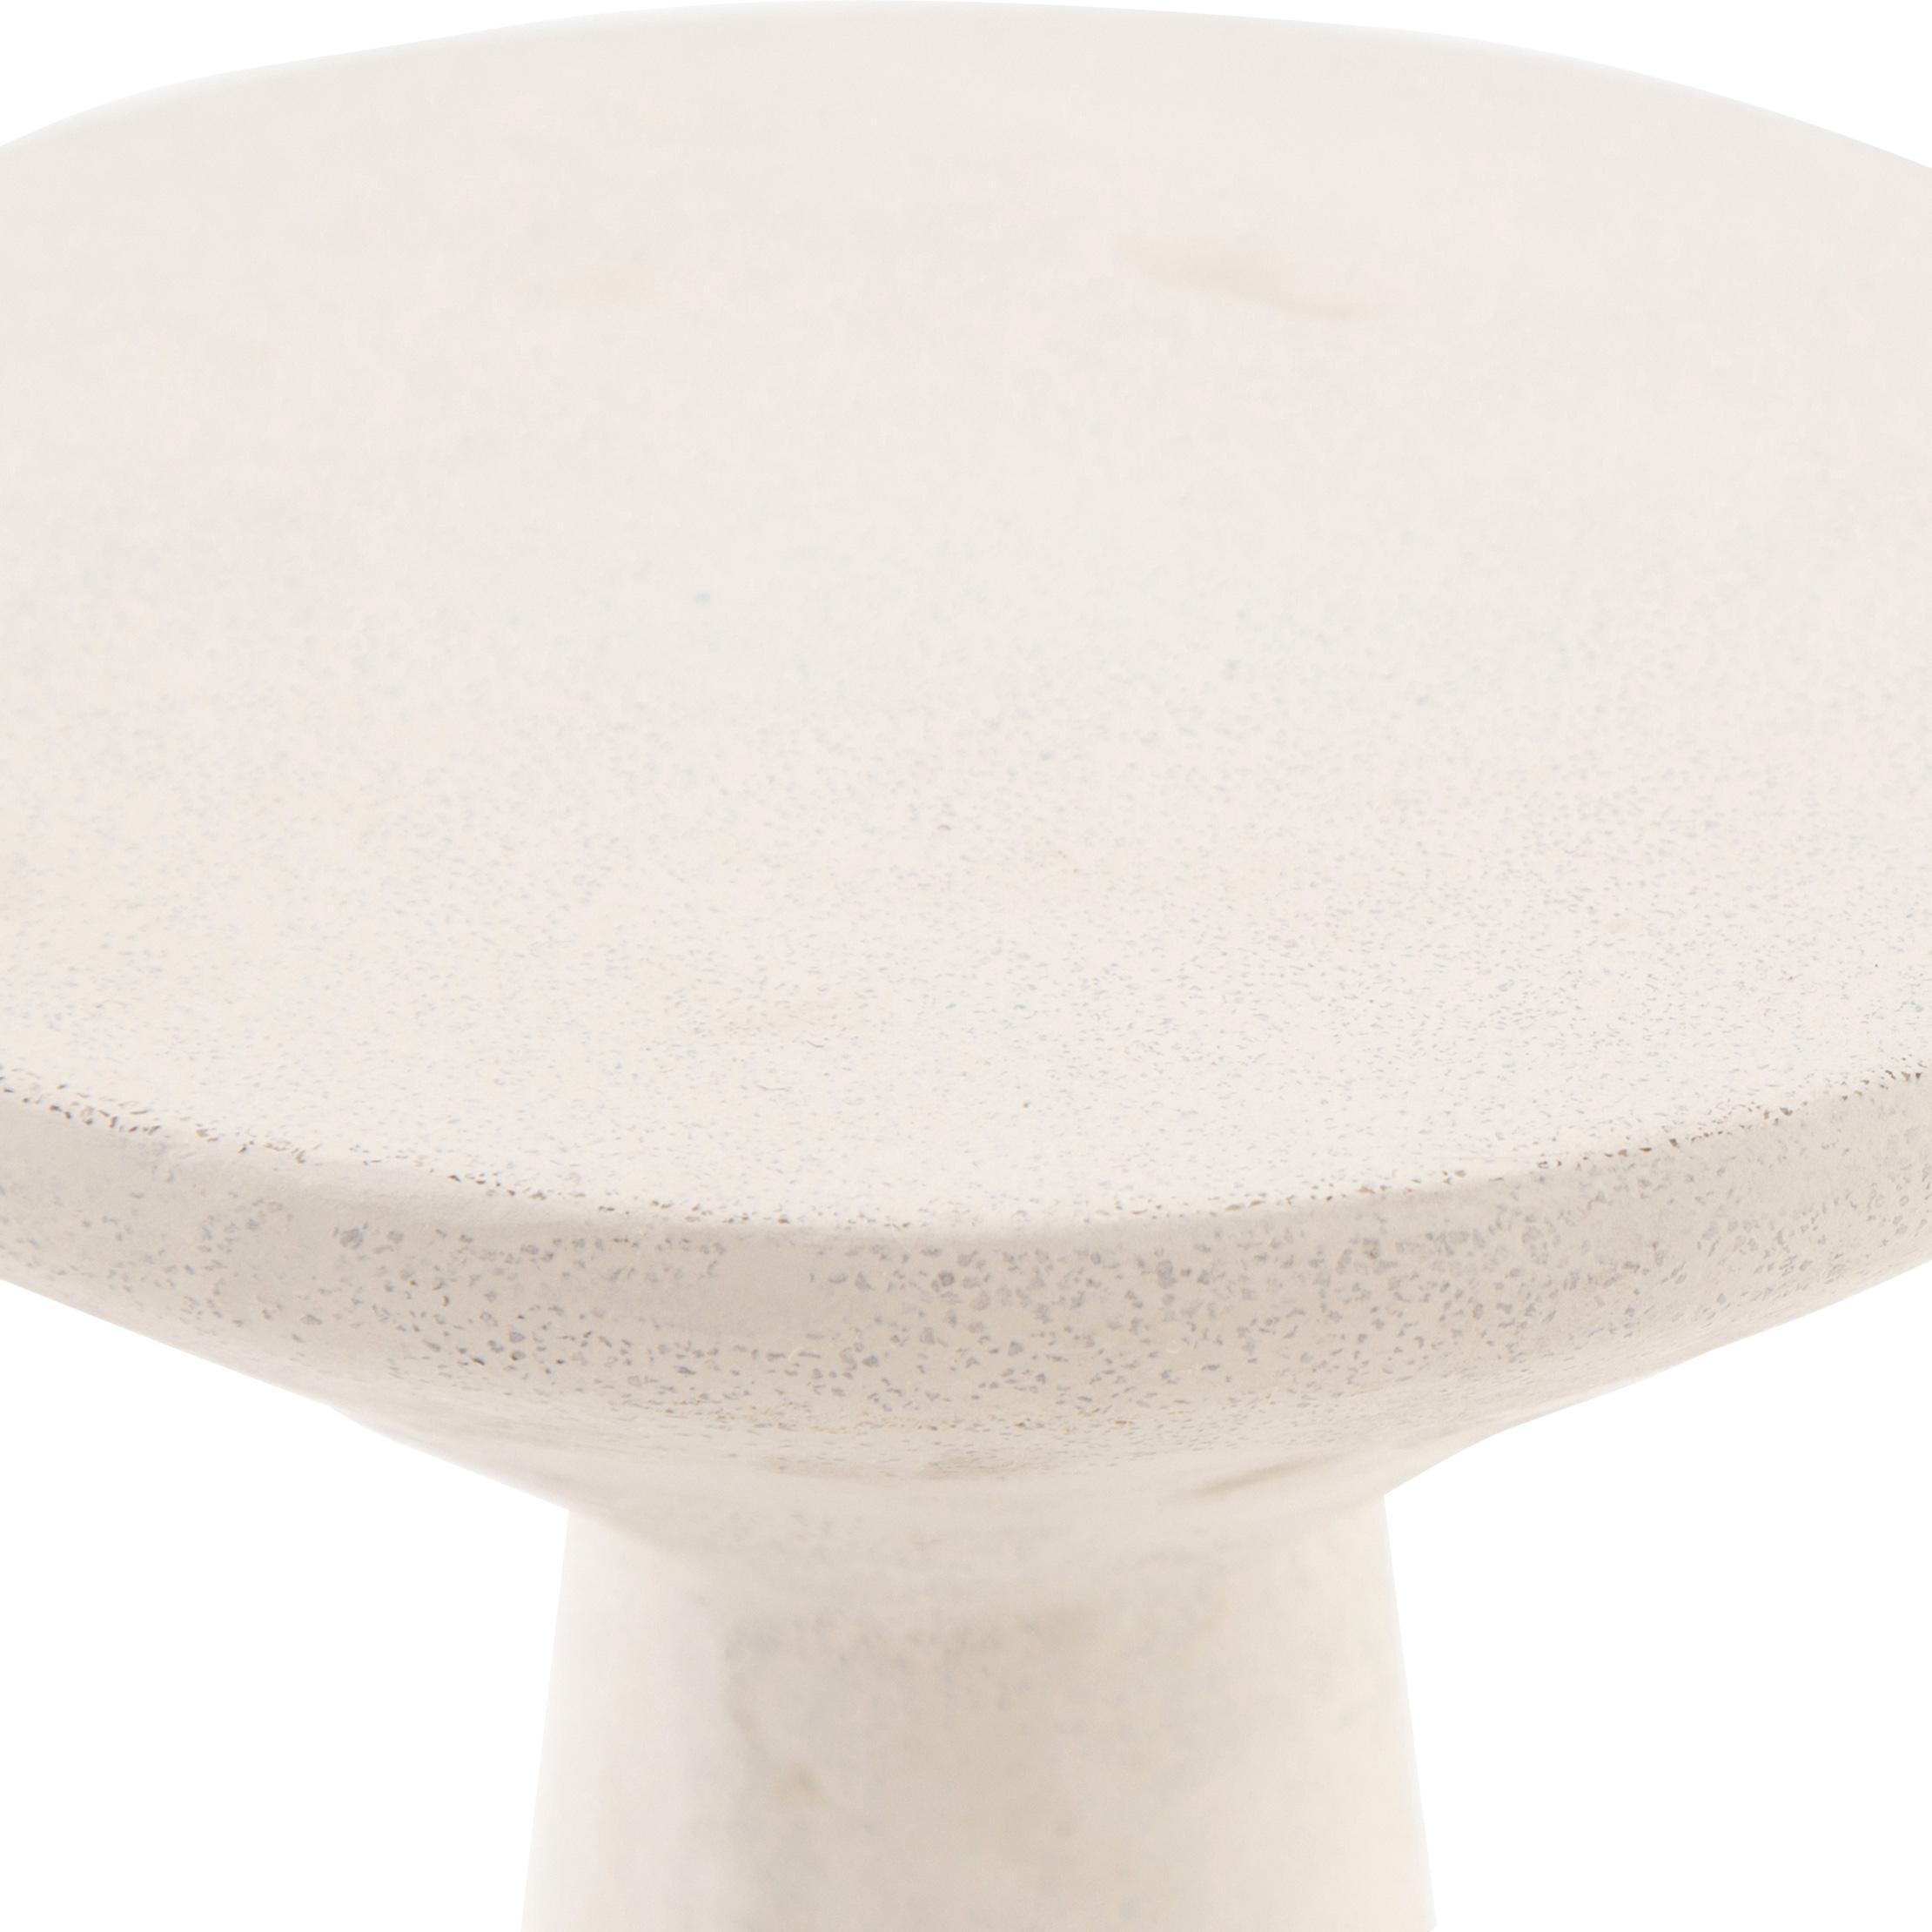 Mika Industrial Bazaar White Concrete Pedestal Accent Tables - Set of 2